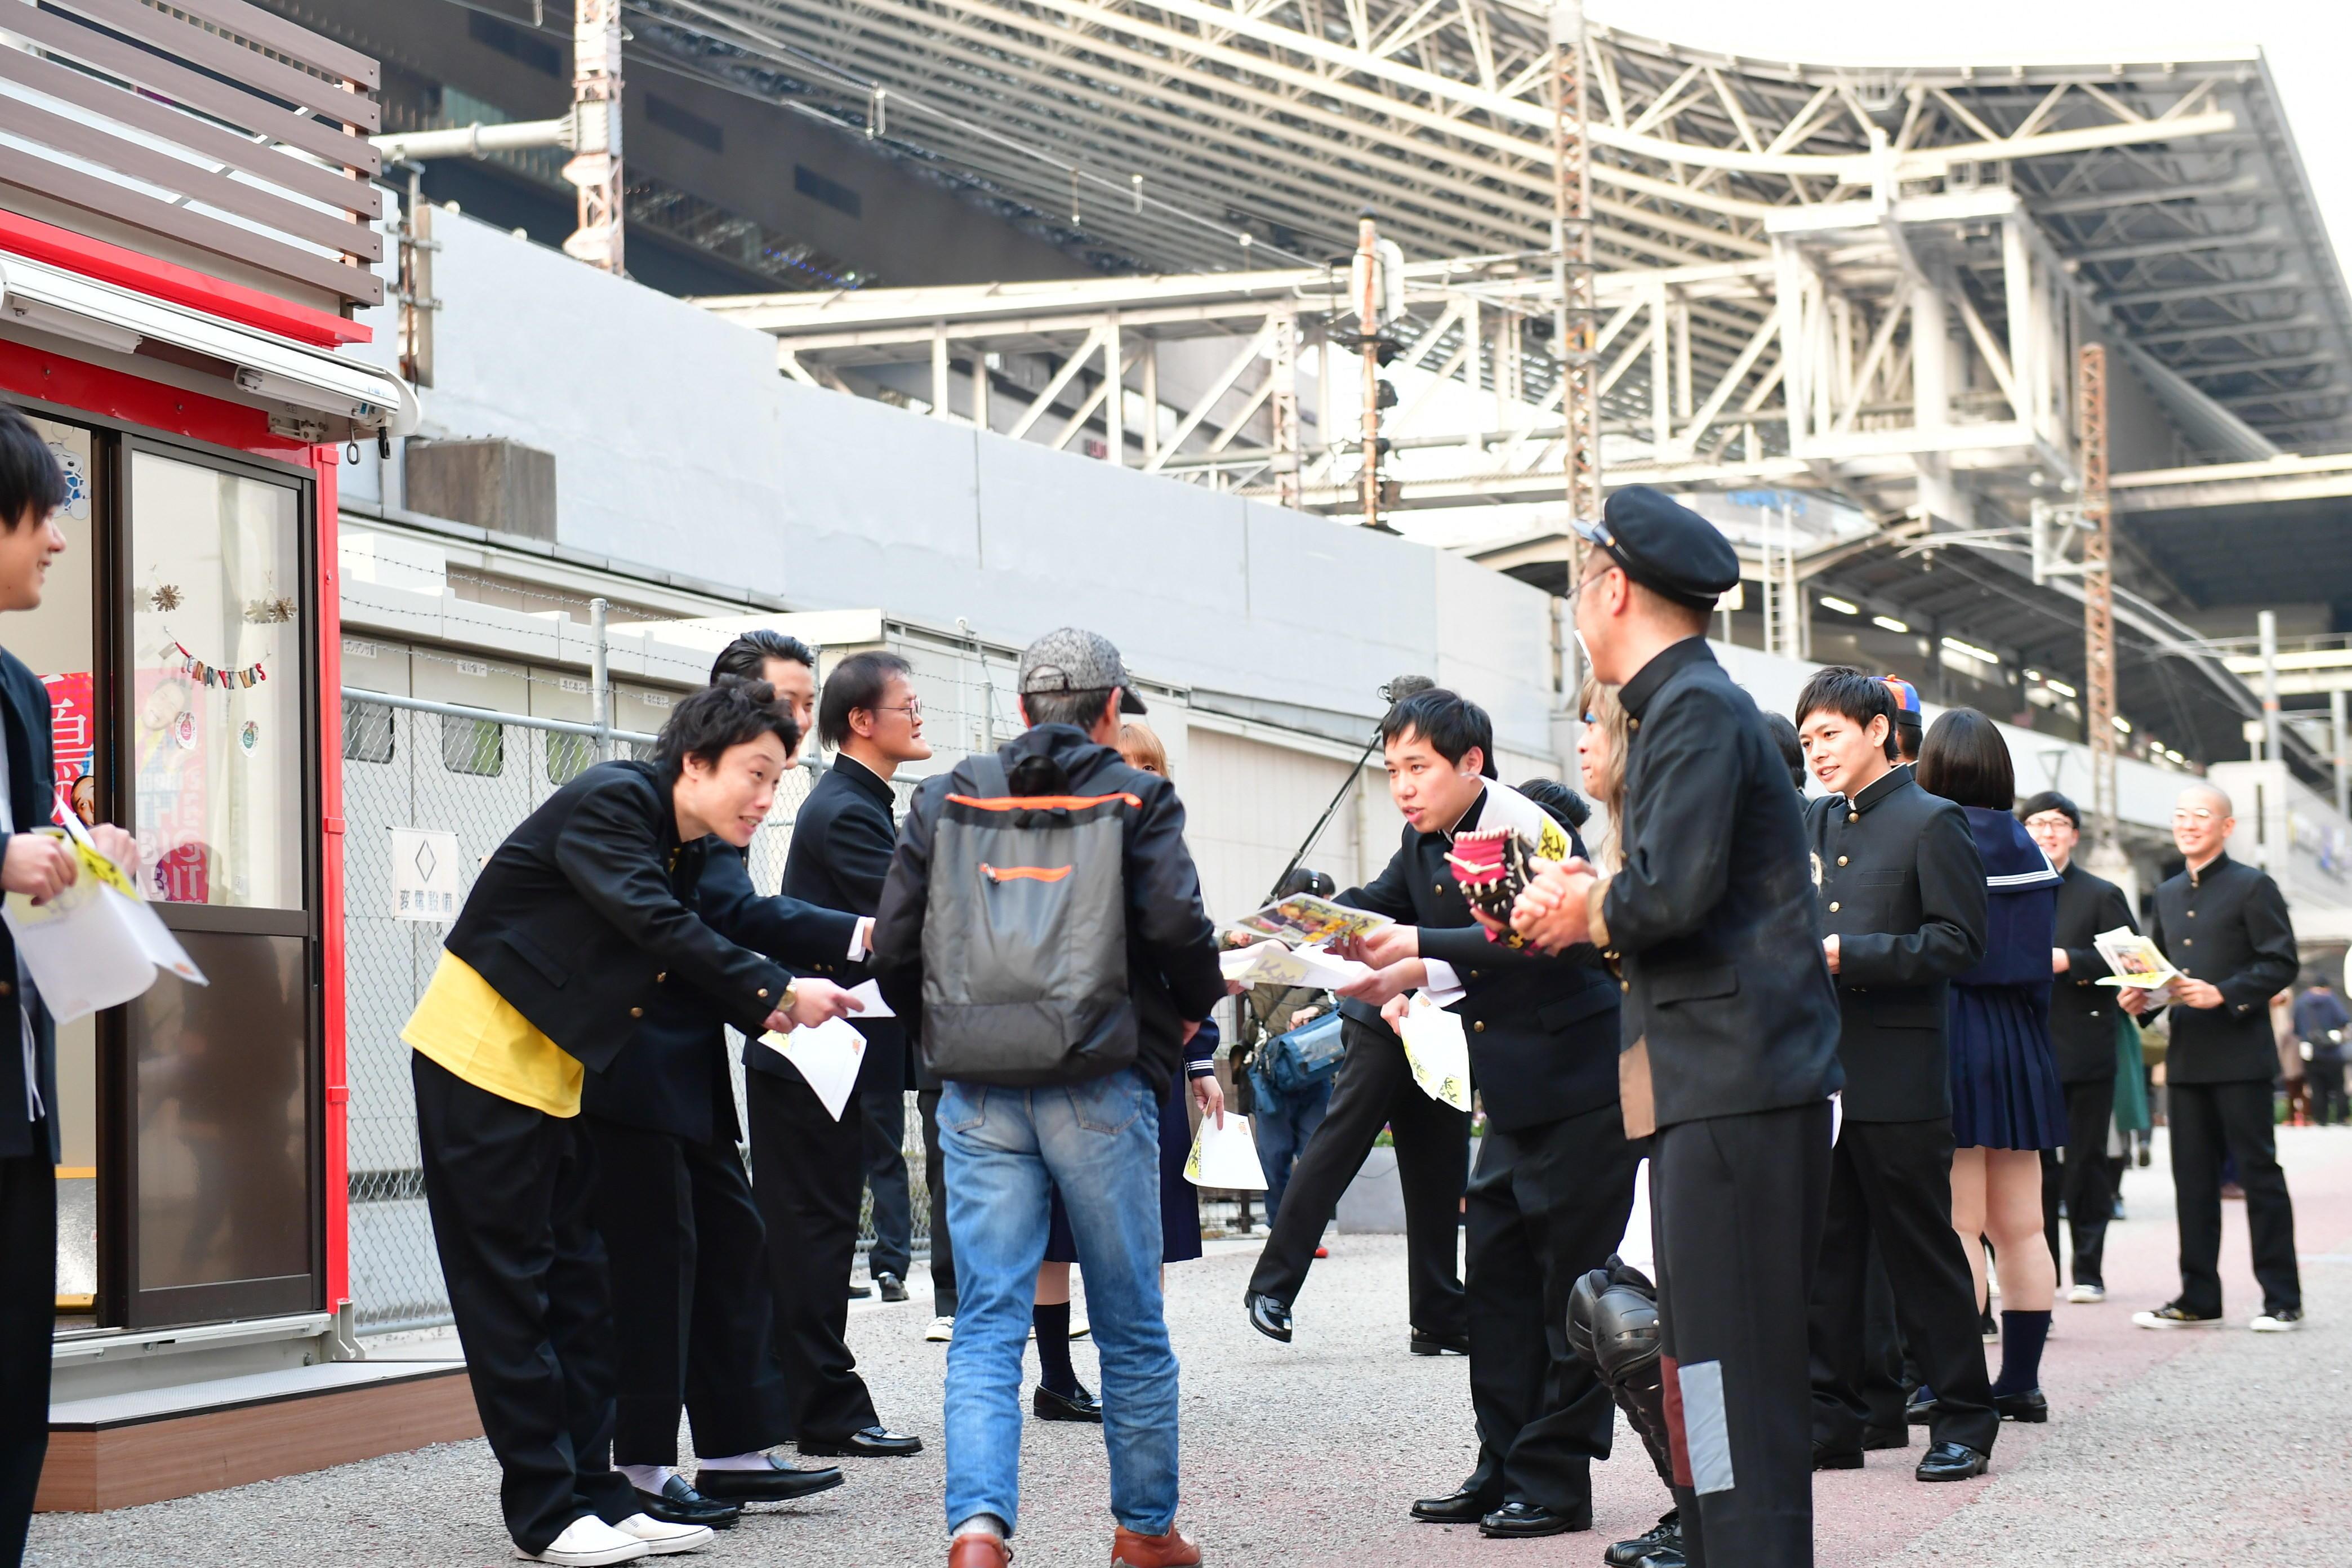 http://news.yoshimoto.co.jp/20181220085728-57f54c071340bda298ffae996ca56fa4d24a407c.jpg